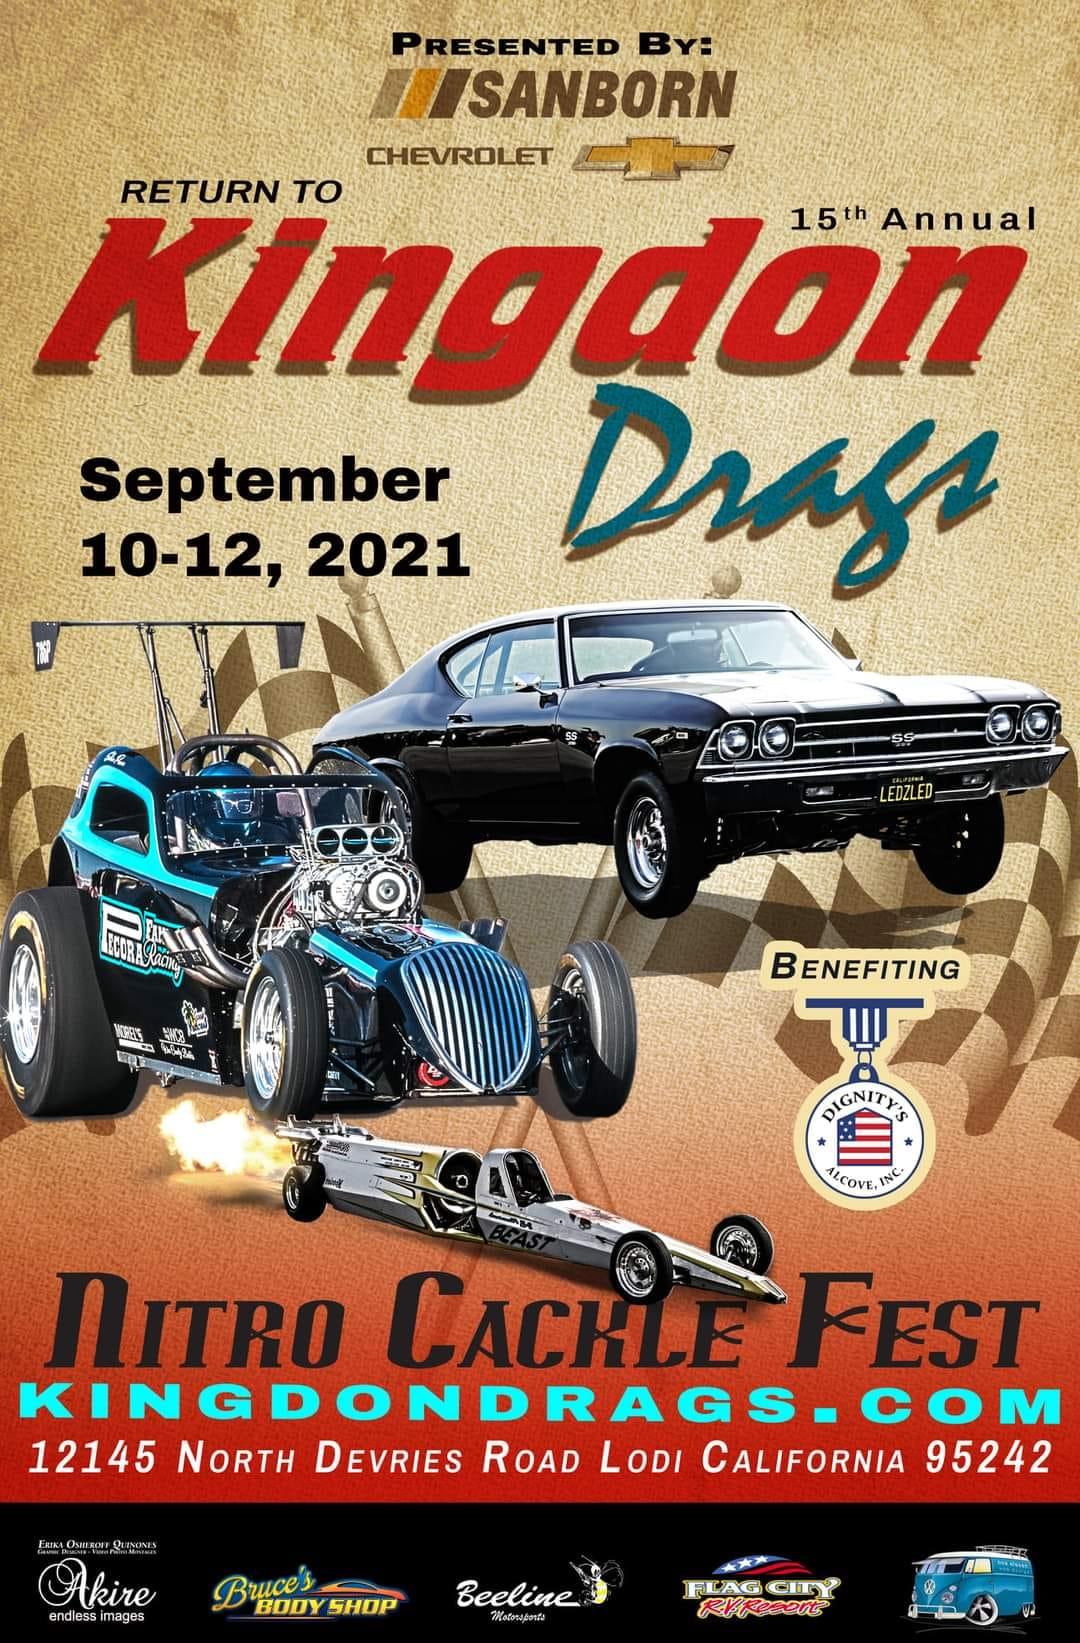 Return to Kingdon Drags